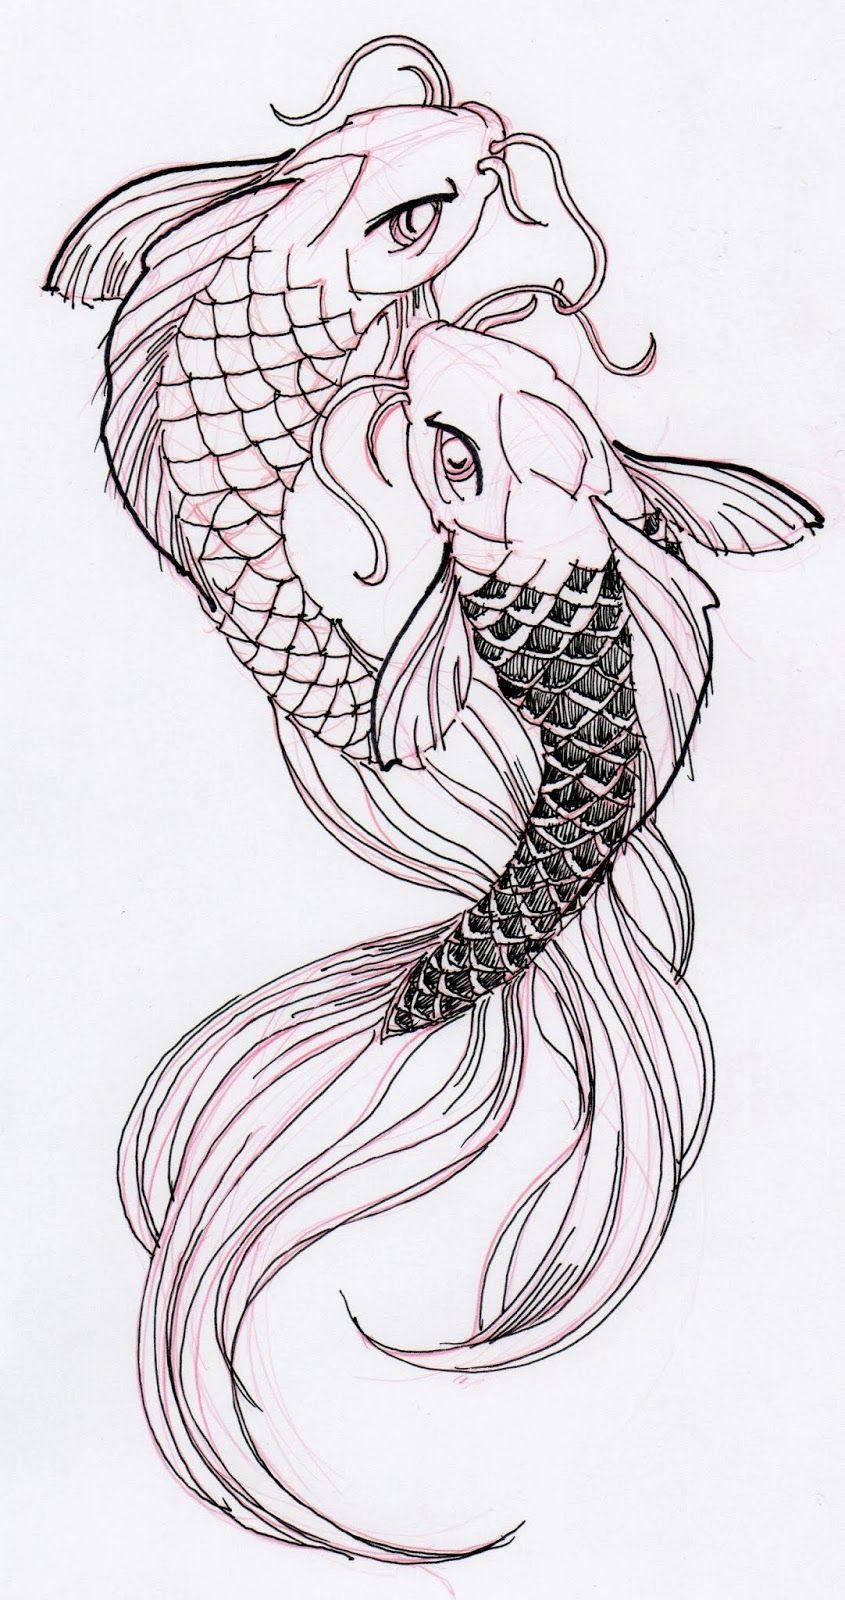 Tattoos for men koi fish two cool koi fish ink drawing  tatuagem  pinterest  koi fish